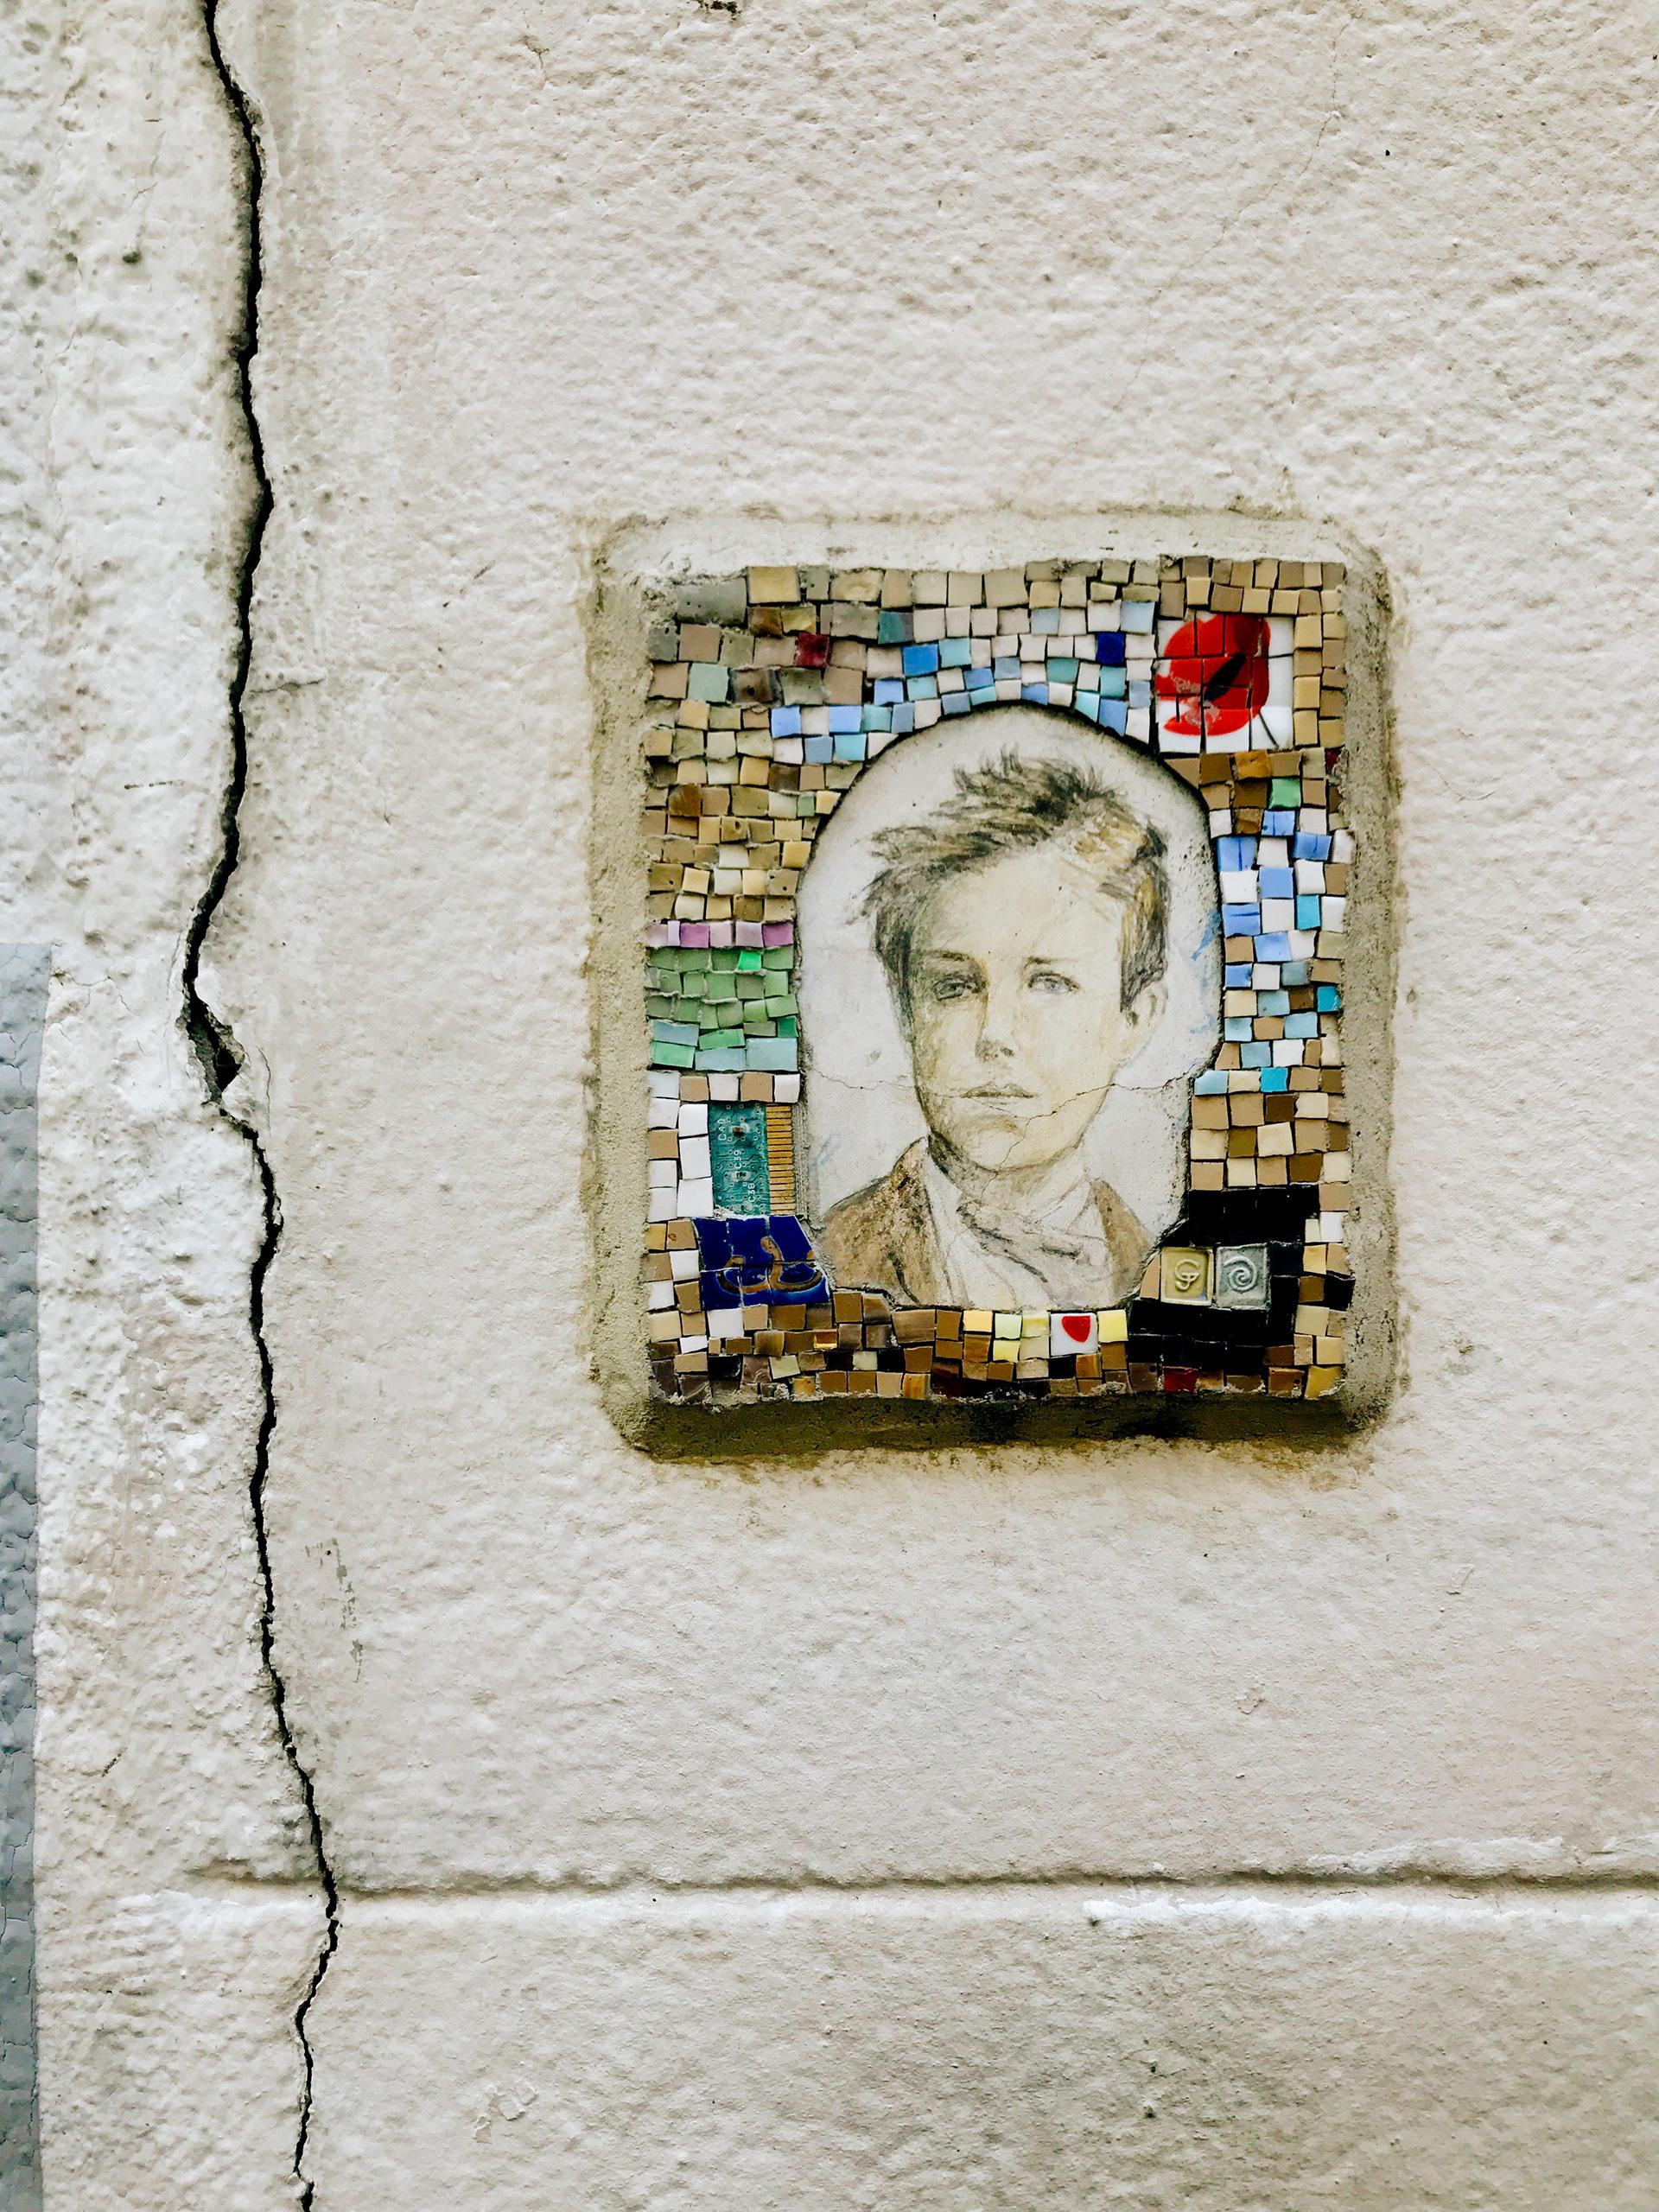 Tribute to Arthur Rimbaud in Montmartre.